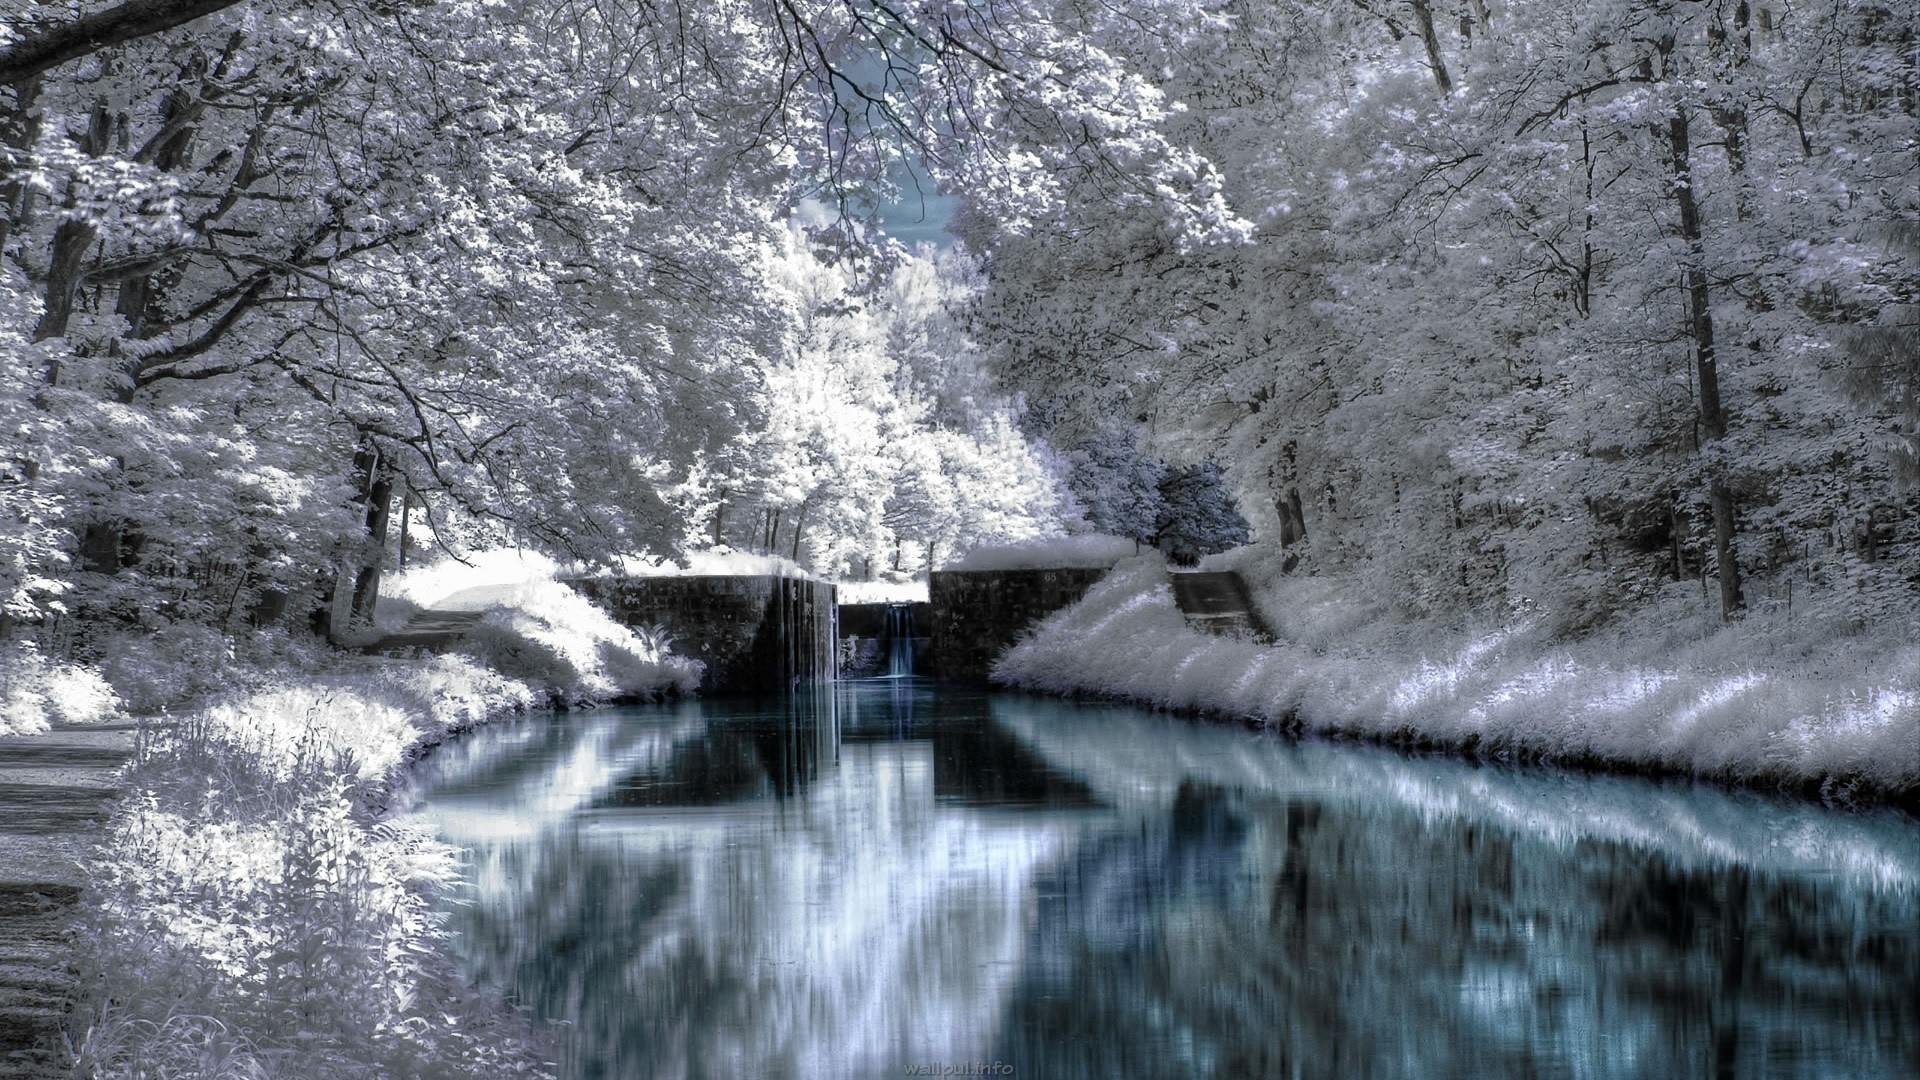 … Celebration Winter Wallpaper Desktop Wallpapers Hd 1080p